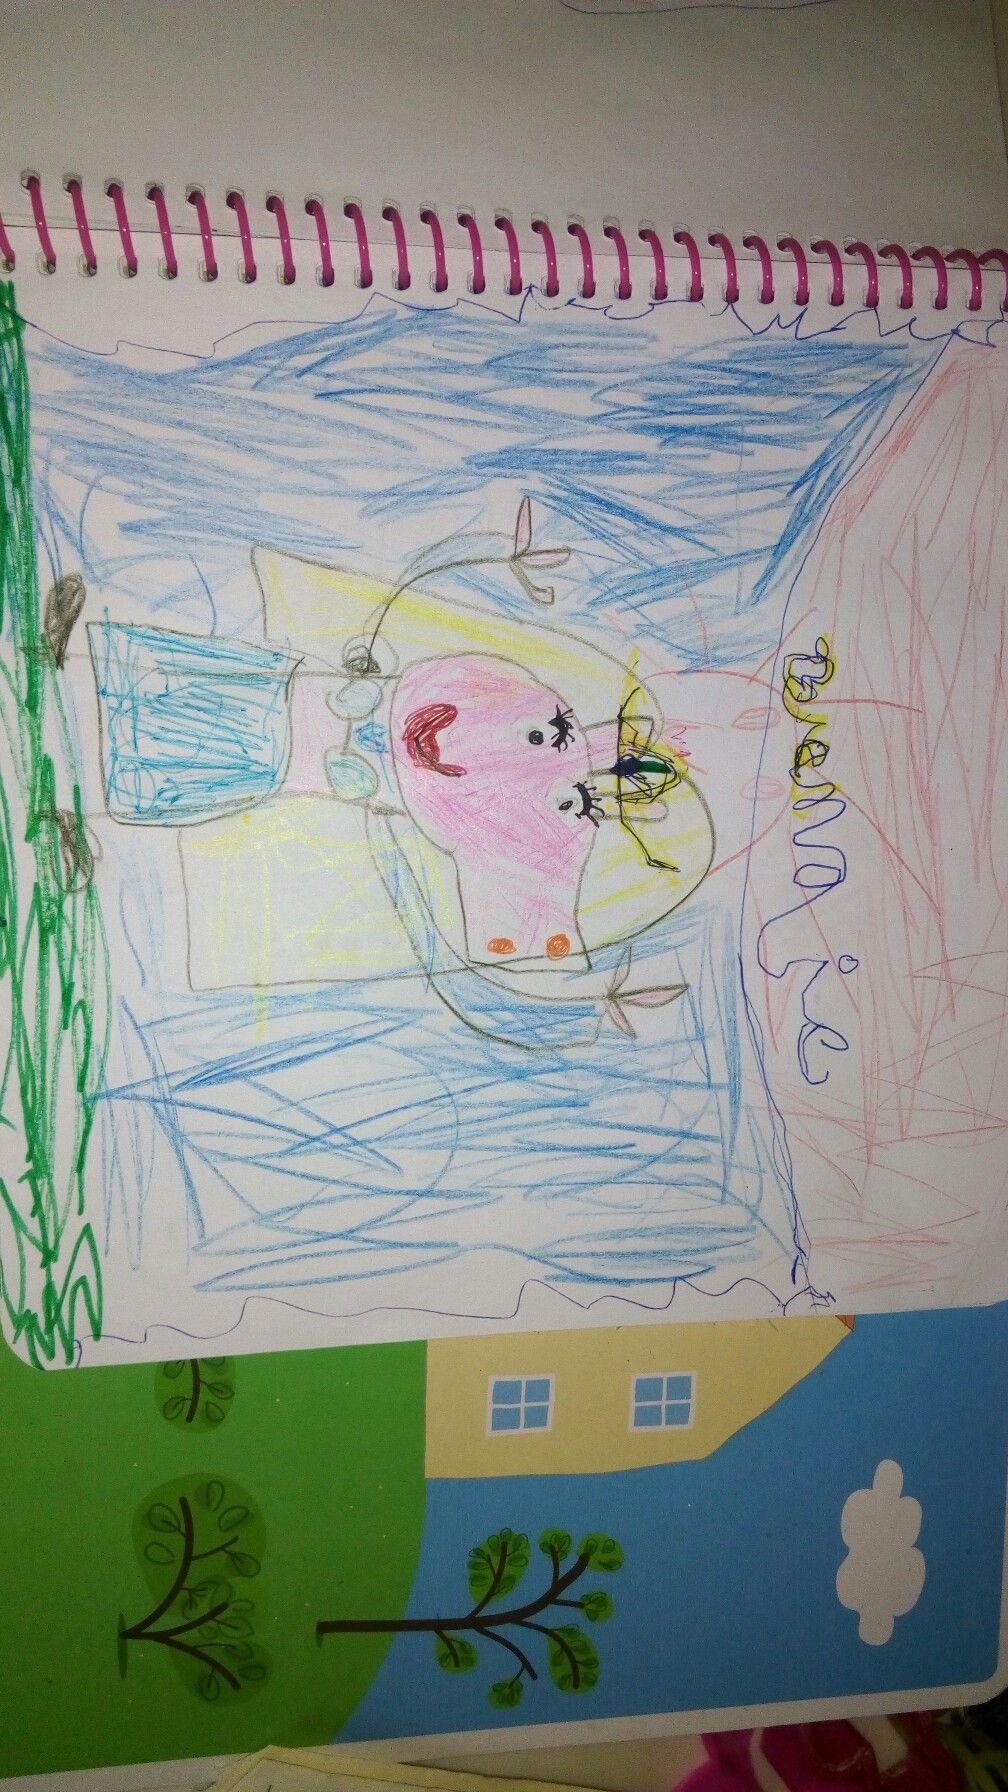 Mi hijita.Dibujos de pepa pig odalisca.